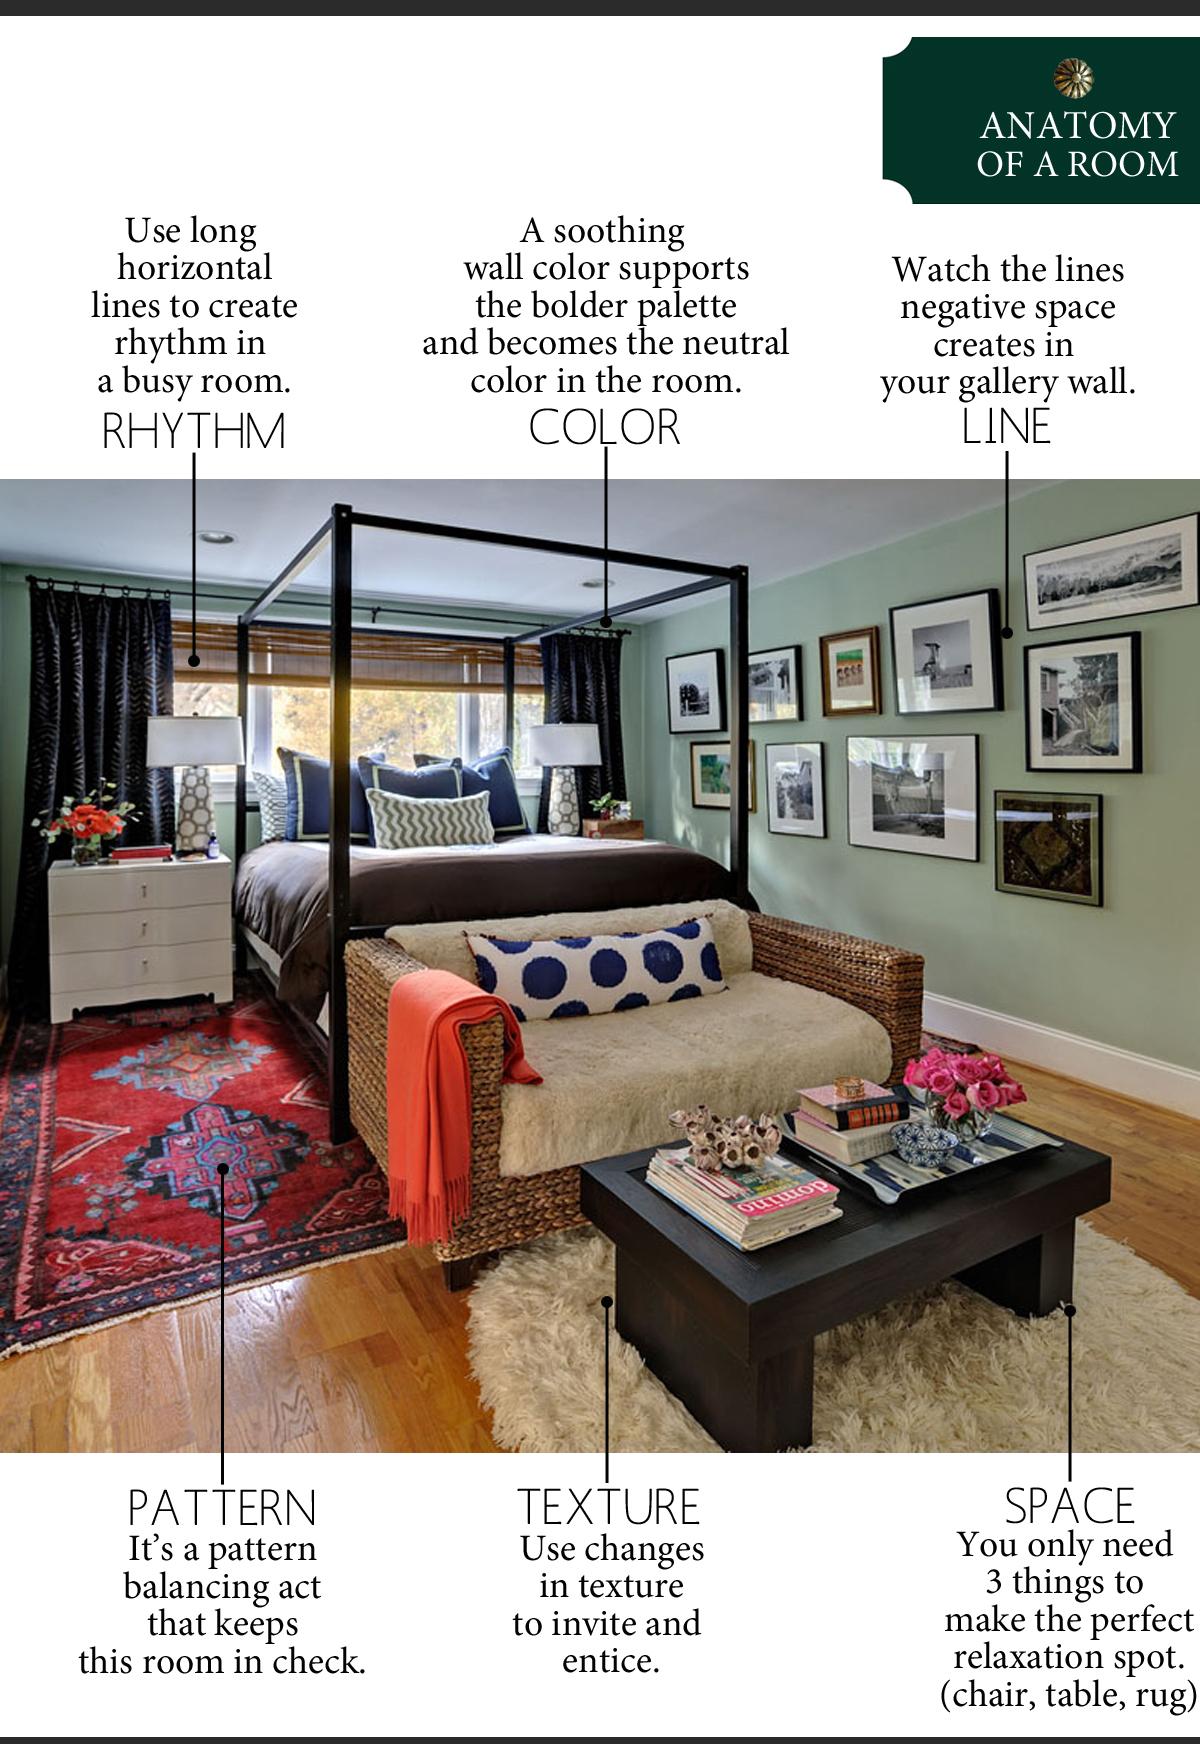 The Anatomy of a Happy Bedroom by Furbish Studio | The Anatomy of Design